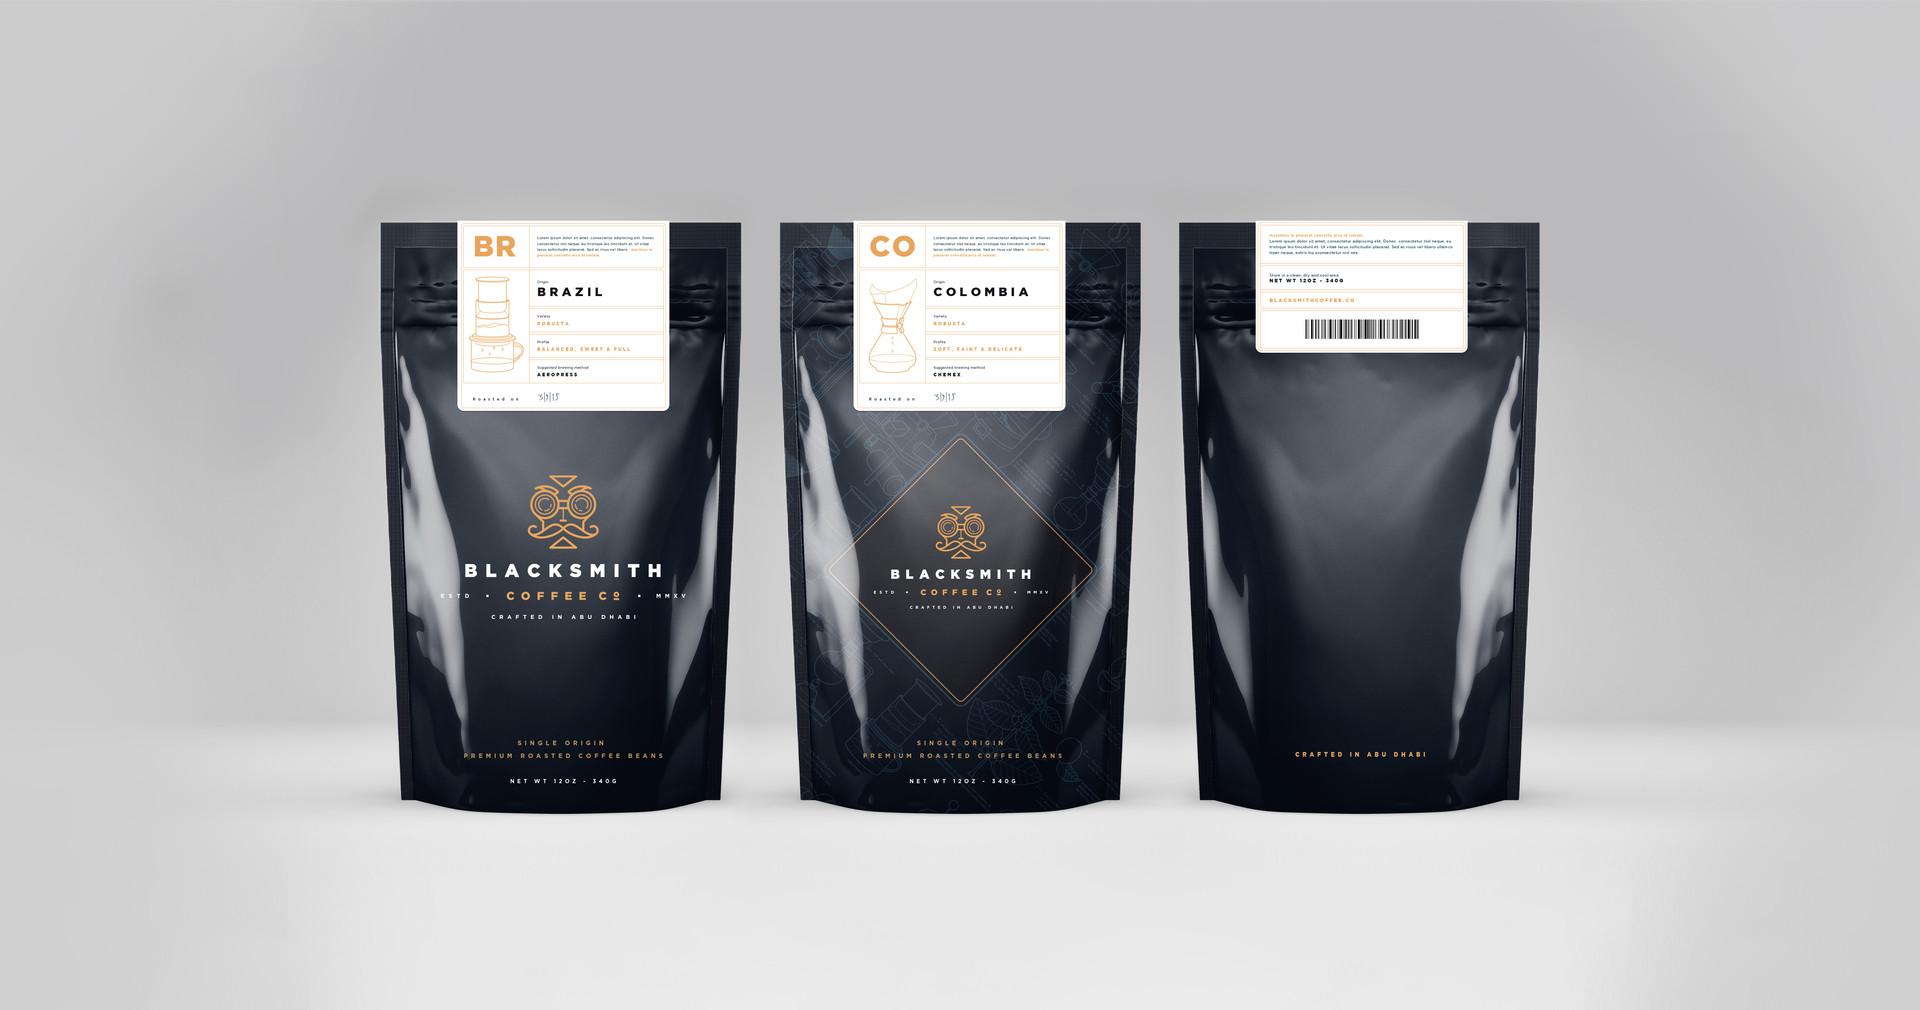 Blacksmith_Coffee Bags.jpg